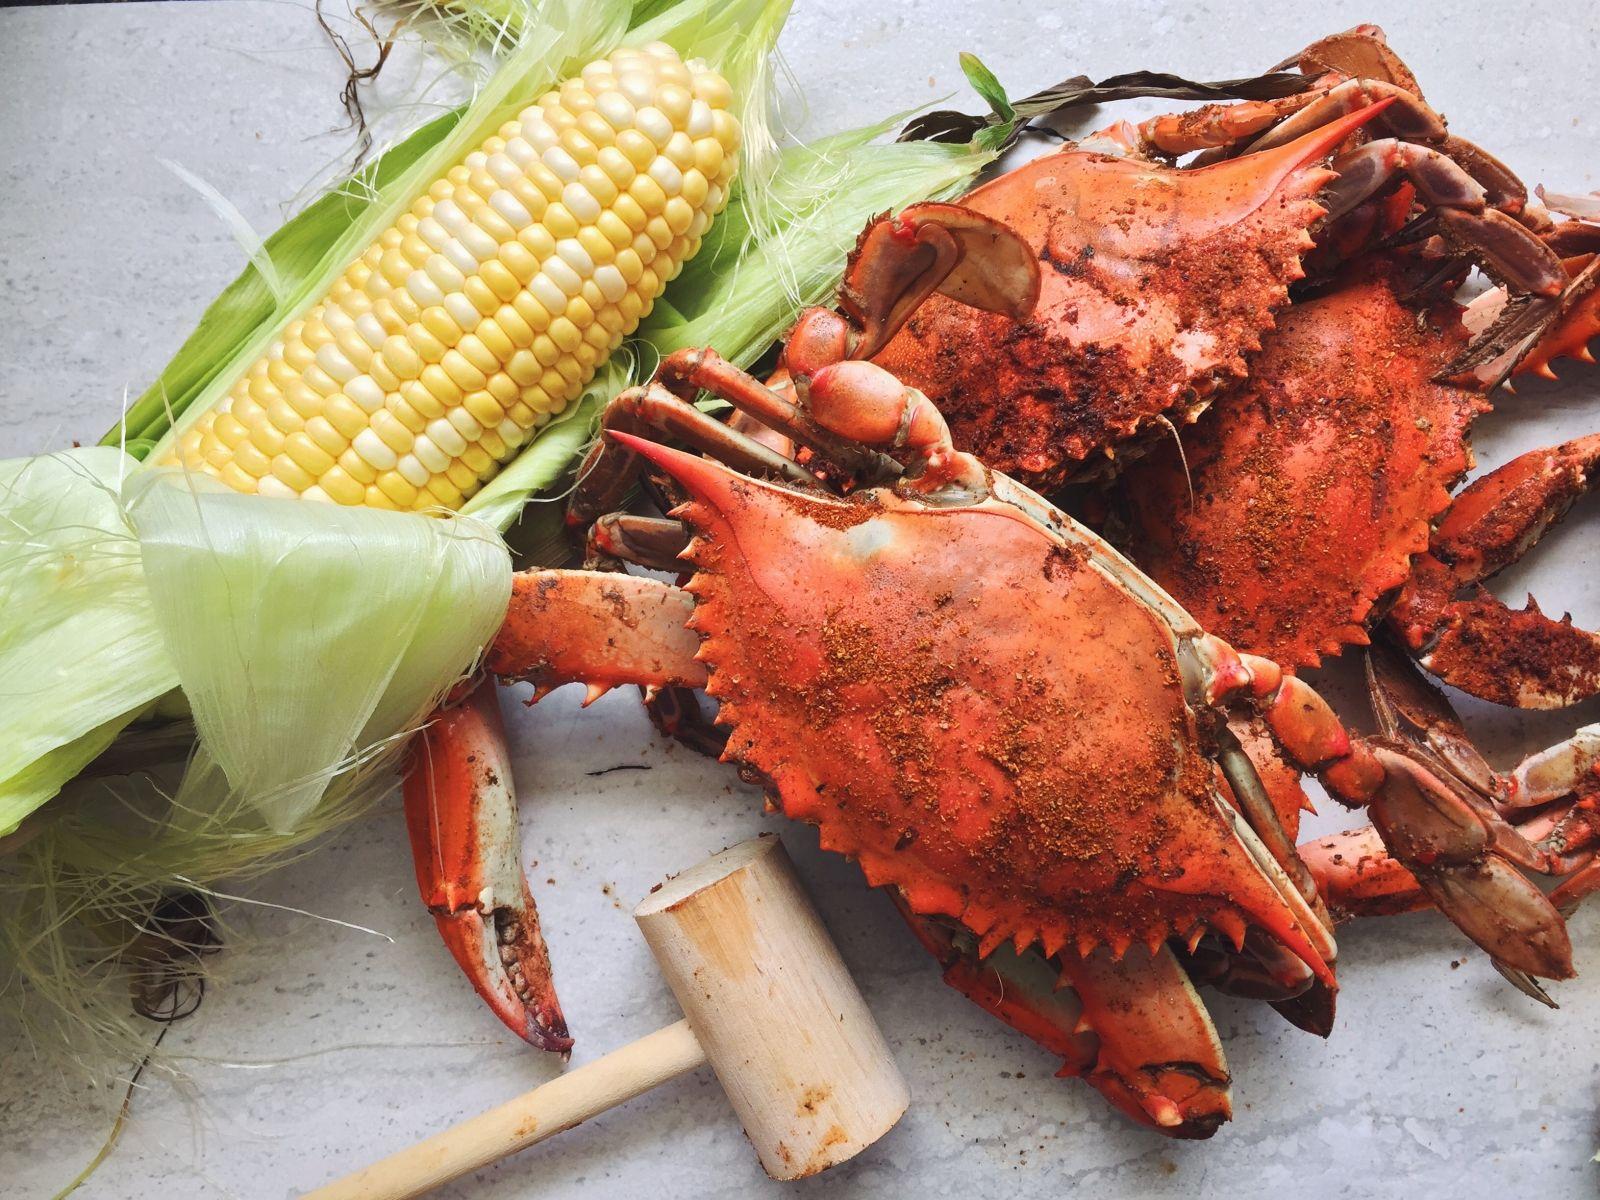 How To Steam Blue Crabs Bay Bites July 2015 Hampton Roads Metropolitan Statistical Area Crab Blue Crab Food